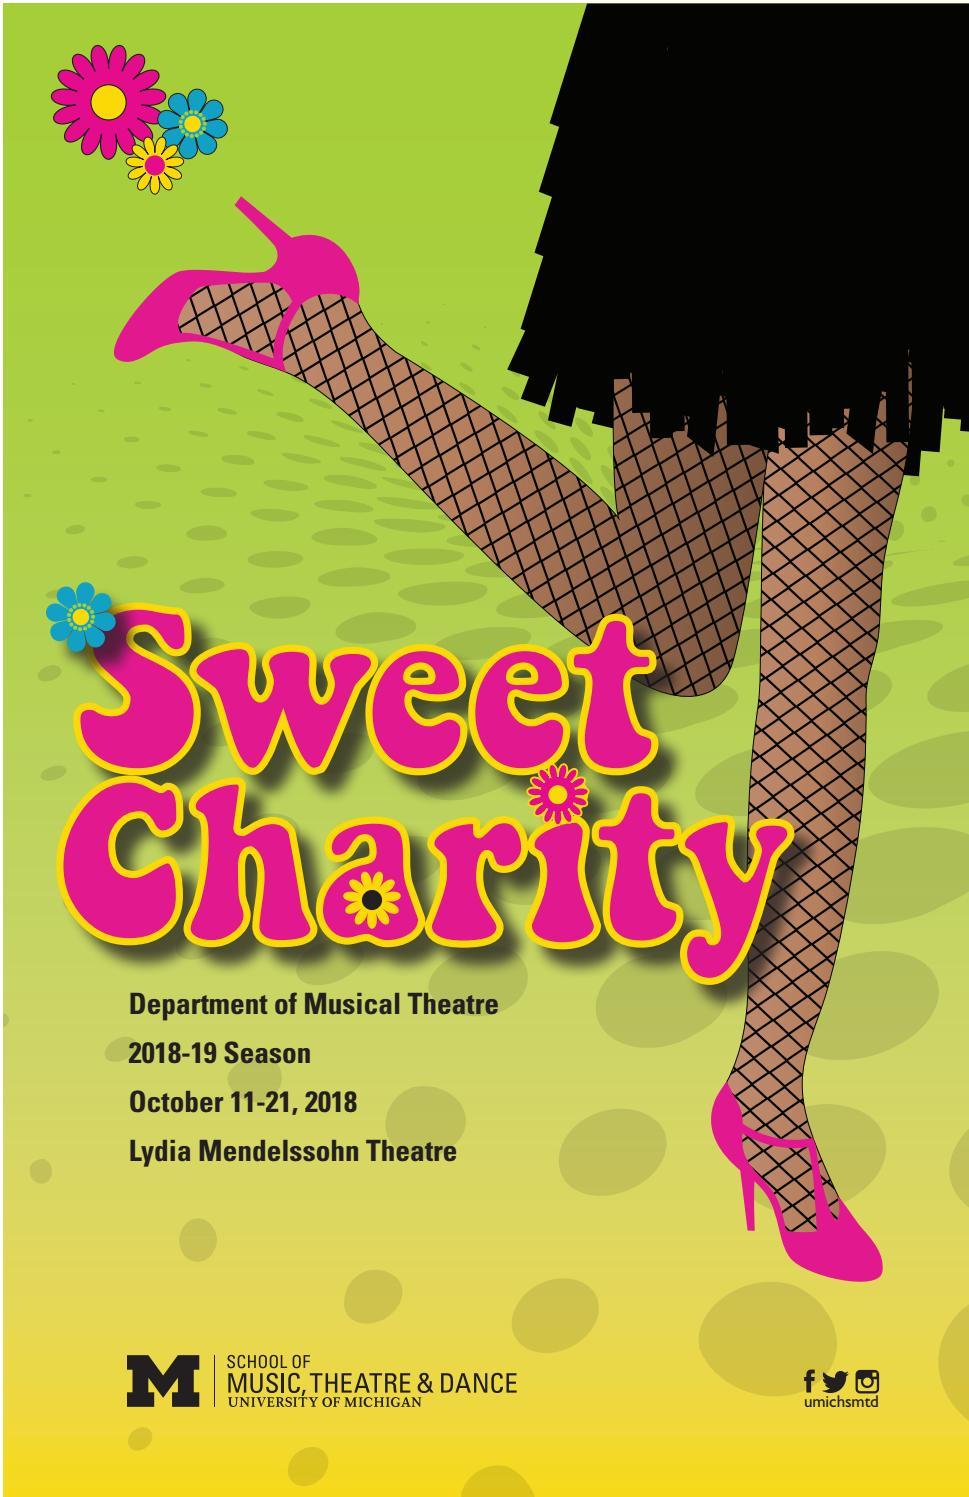 Sweet Charity program by University of Michigan School of